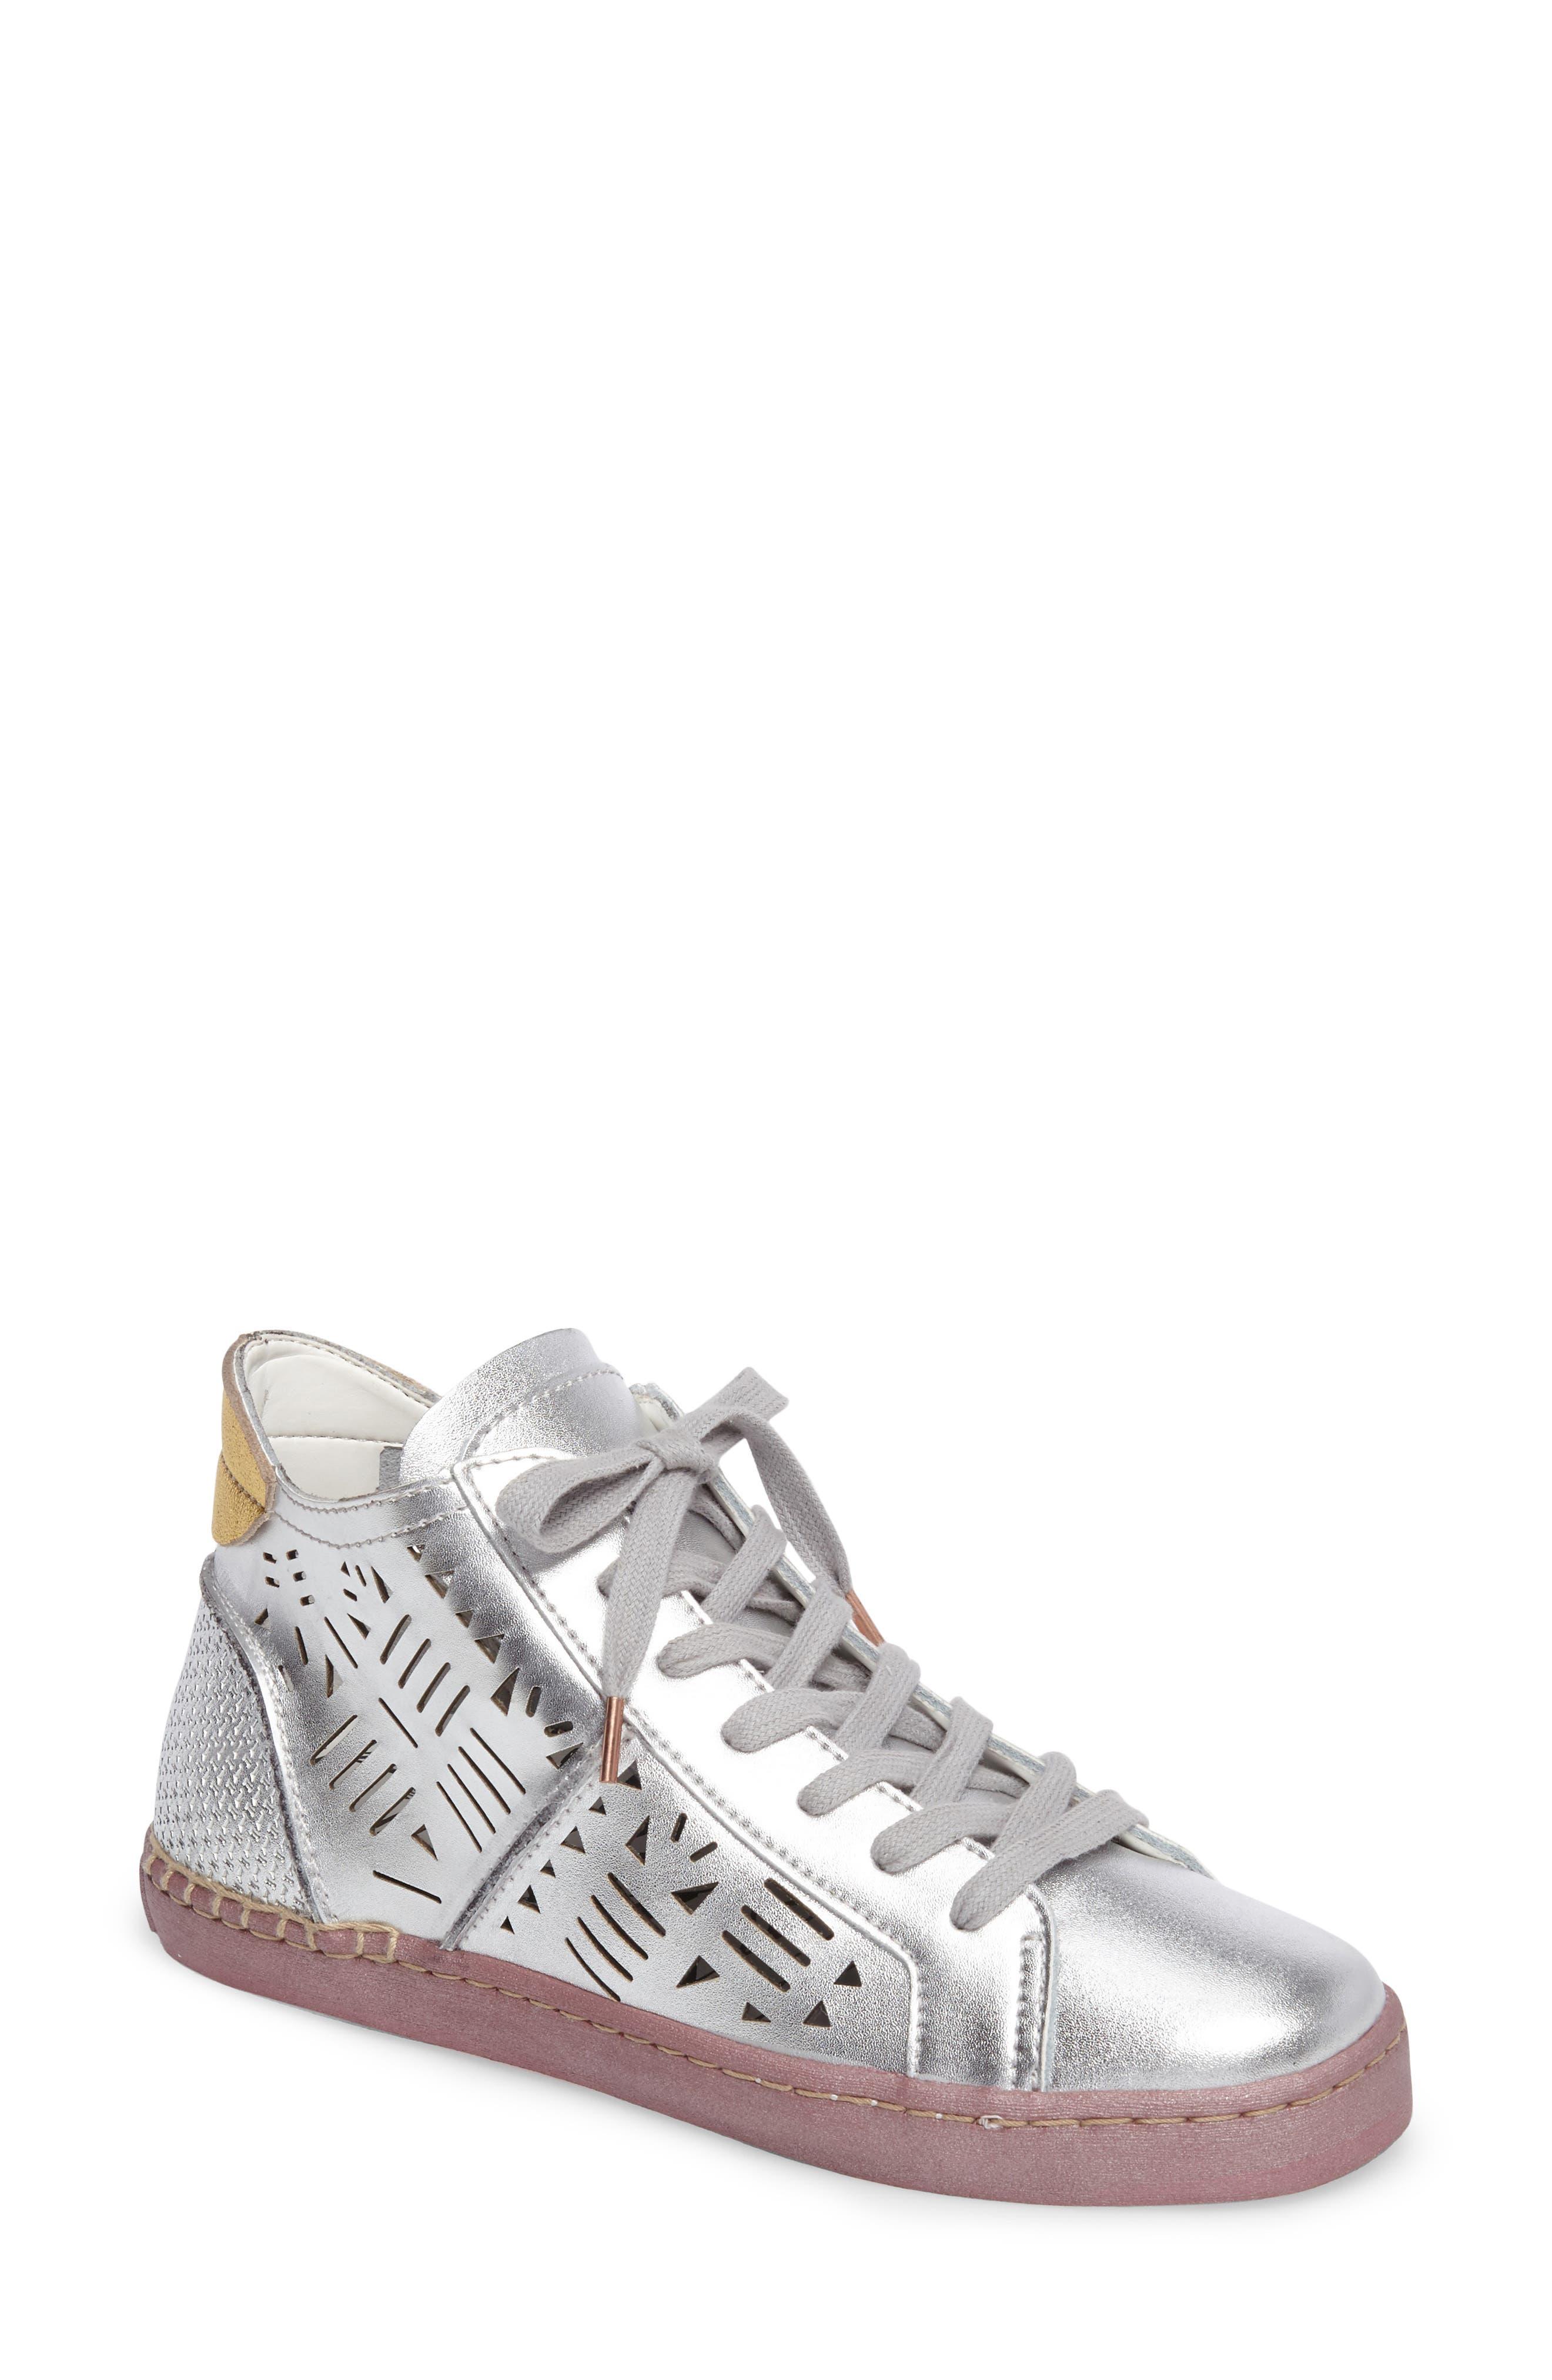 Alternate Image 1 Selected - Dolce Vita Zeus Sneaker (Women)